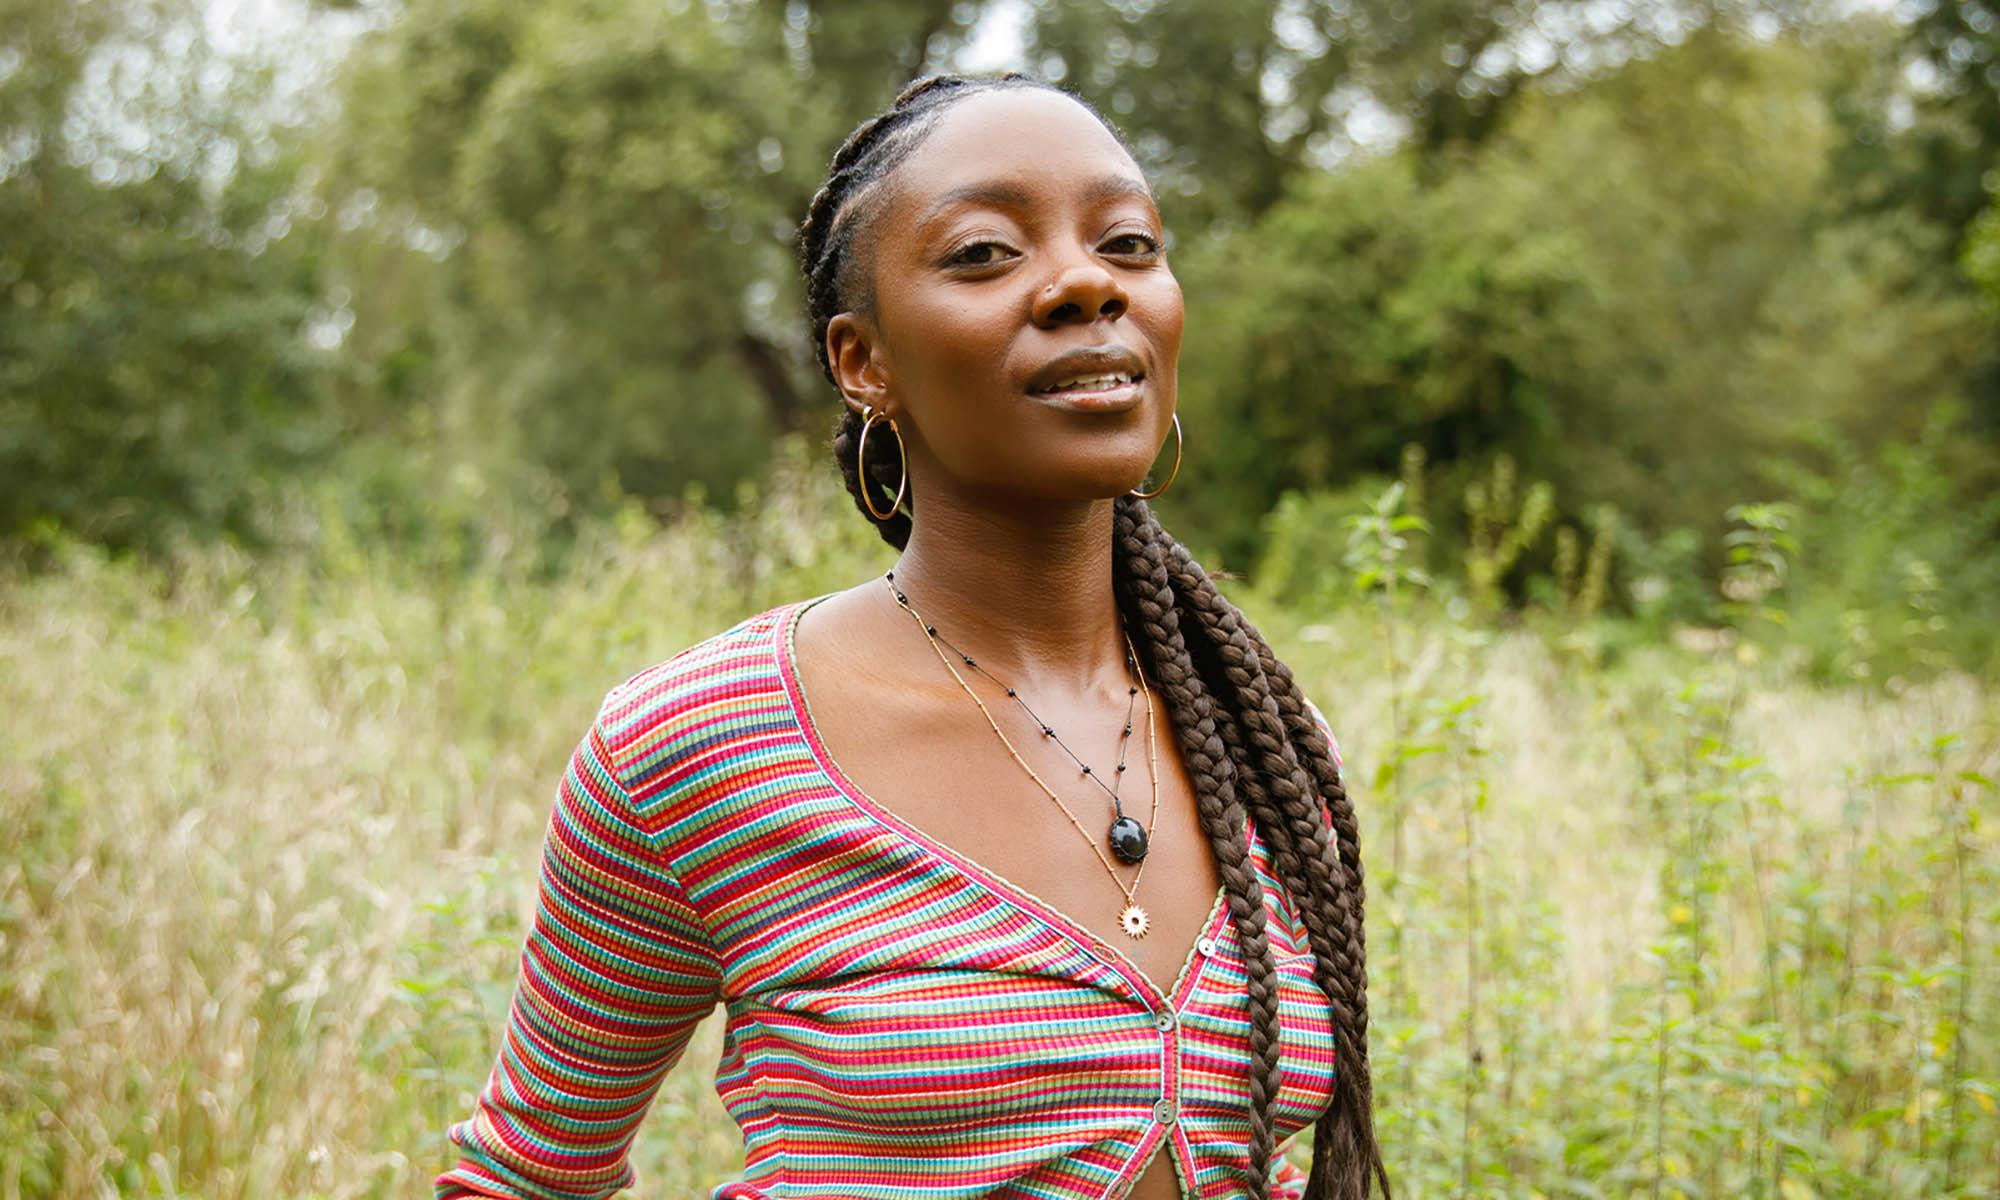 Climate In Colour founder Joycelyn Longdon, greenery in background